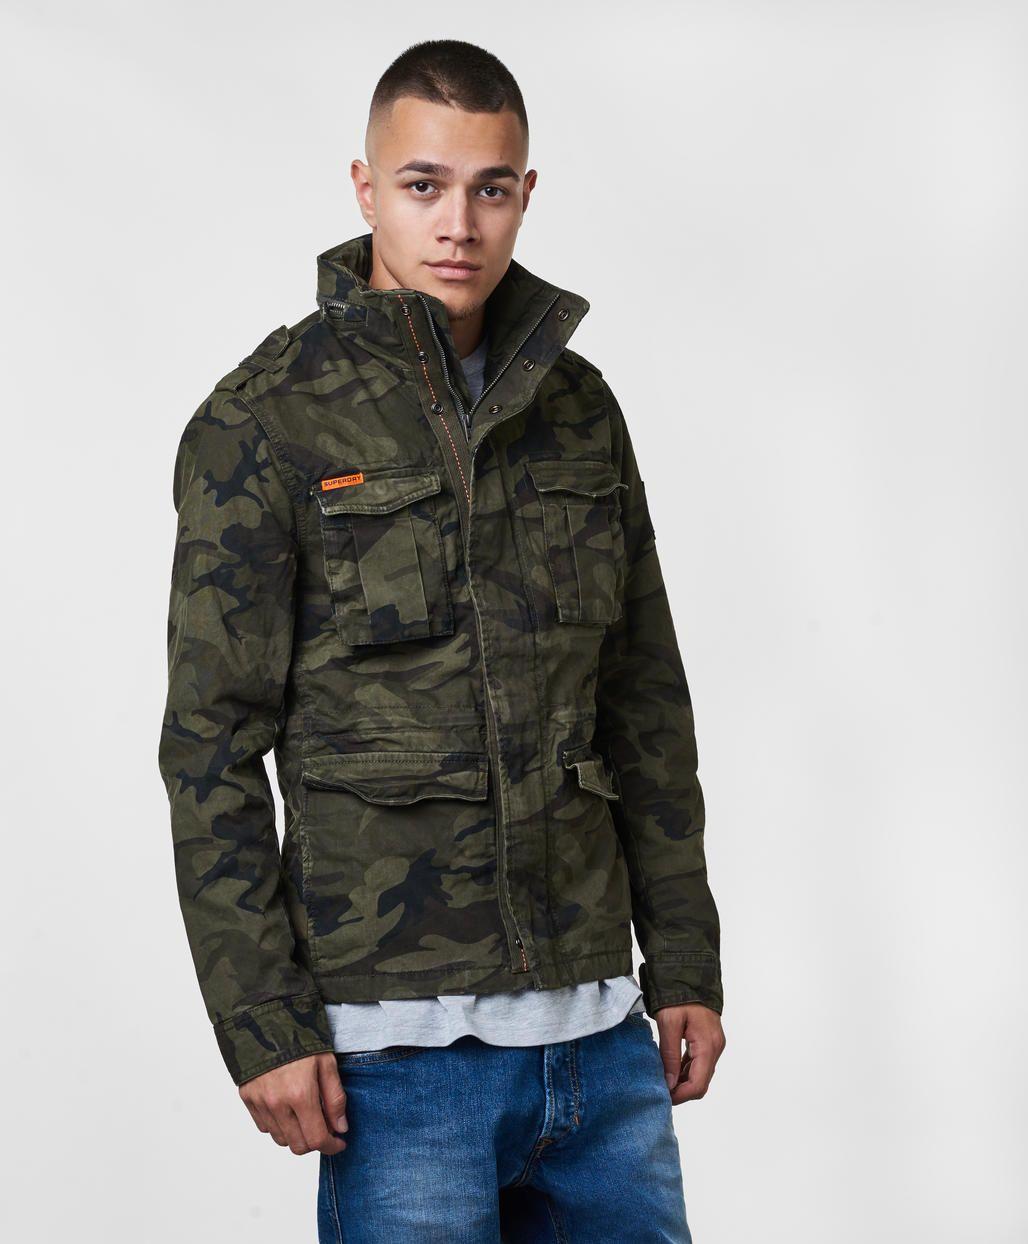 Rookie Military Jacket | Military jacket, Jackets, Superdry